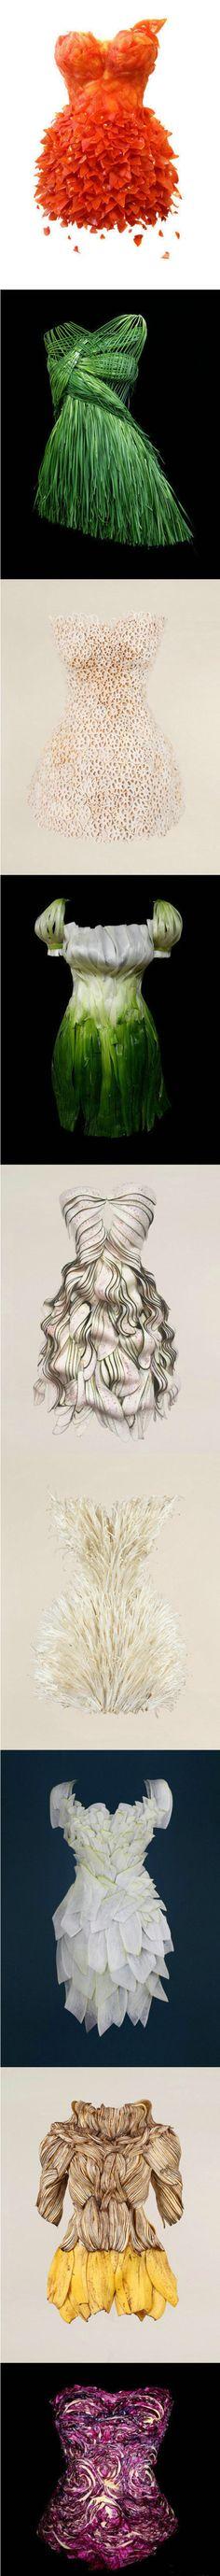 vegetable in fashion design